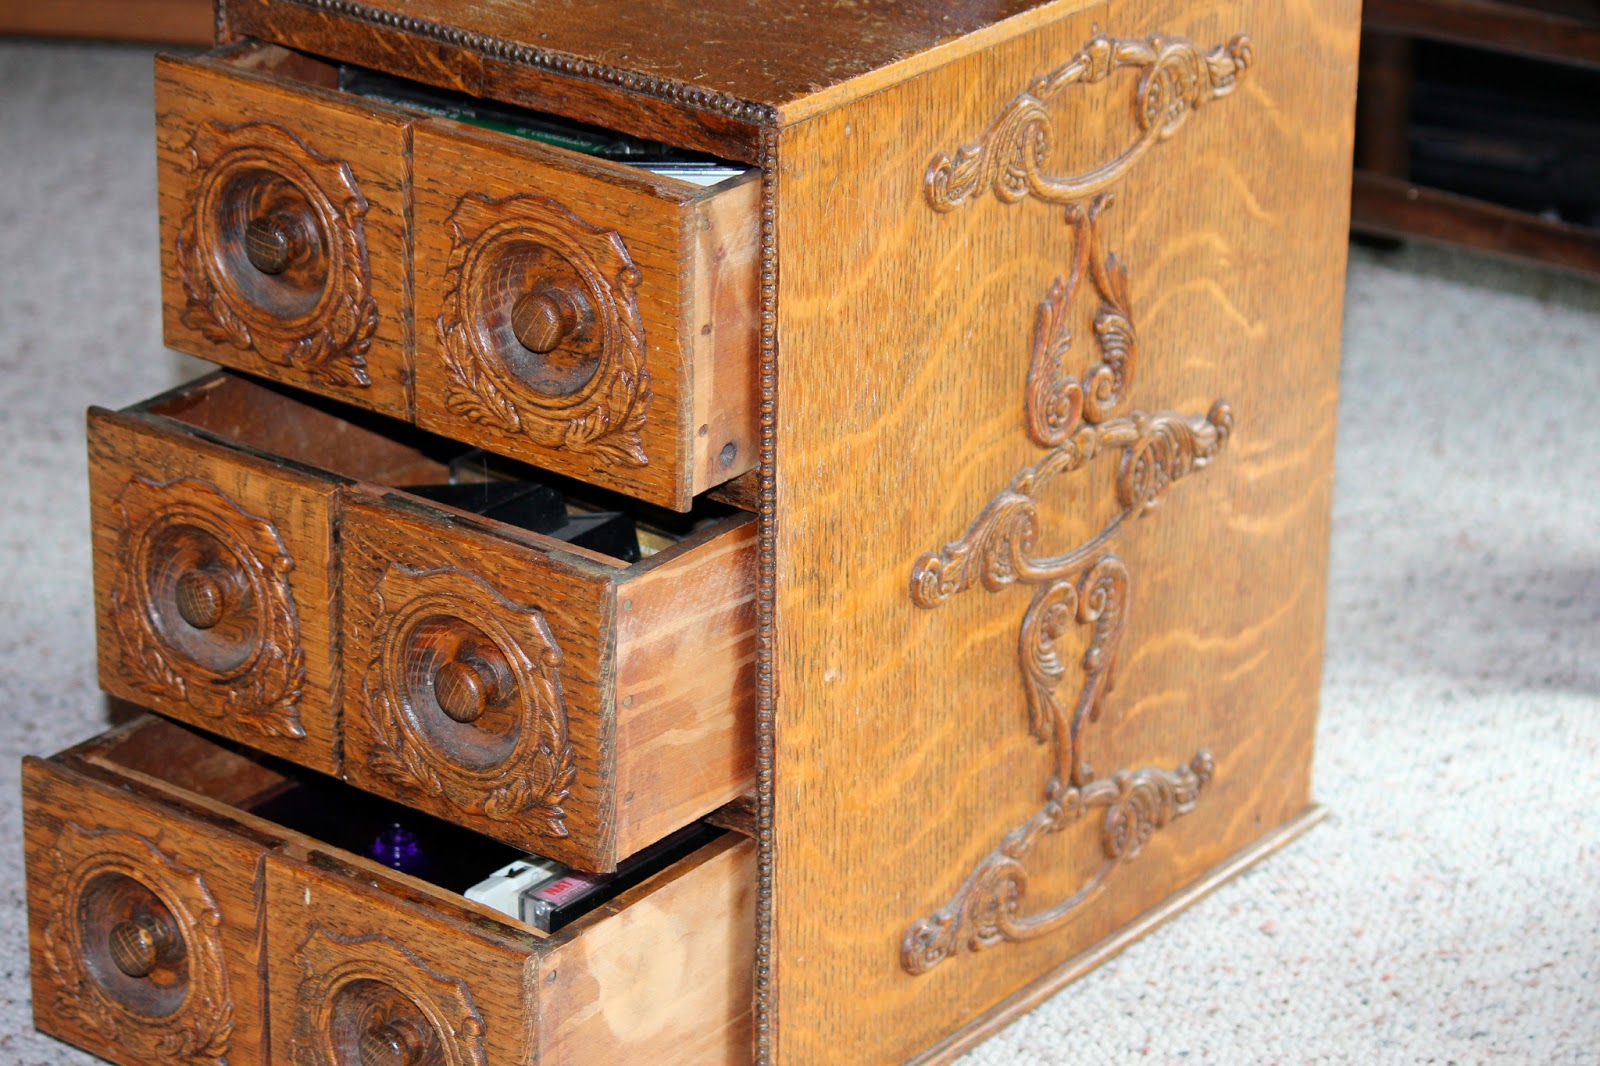 The Cabin Countess Treadle Sewing Machine Repurposed